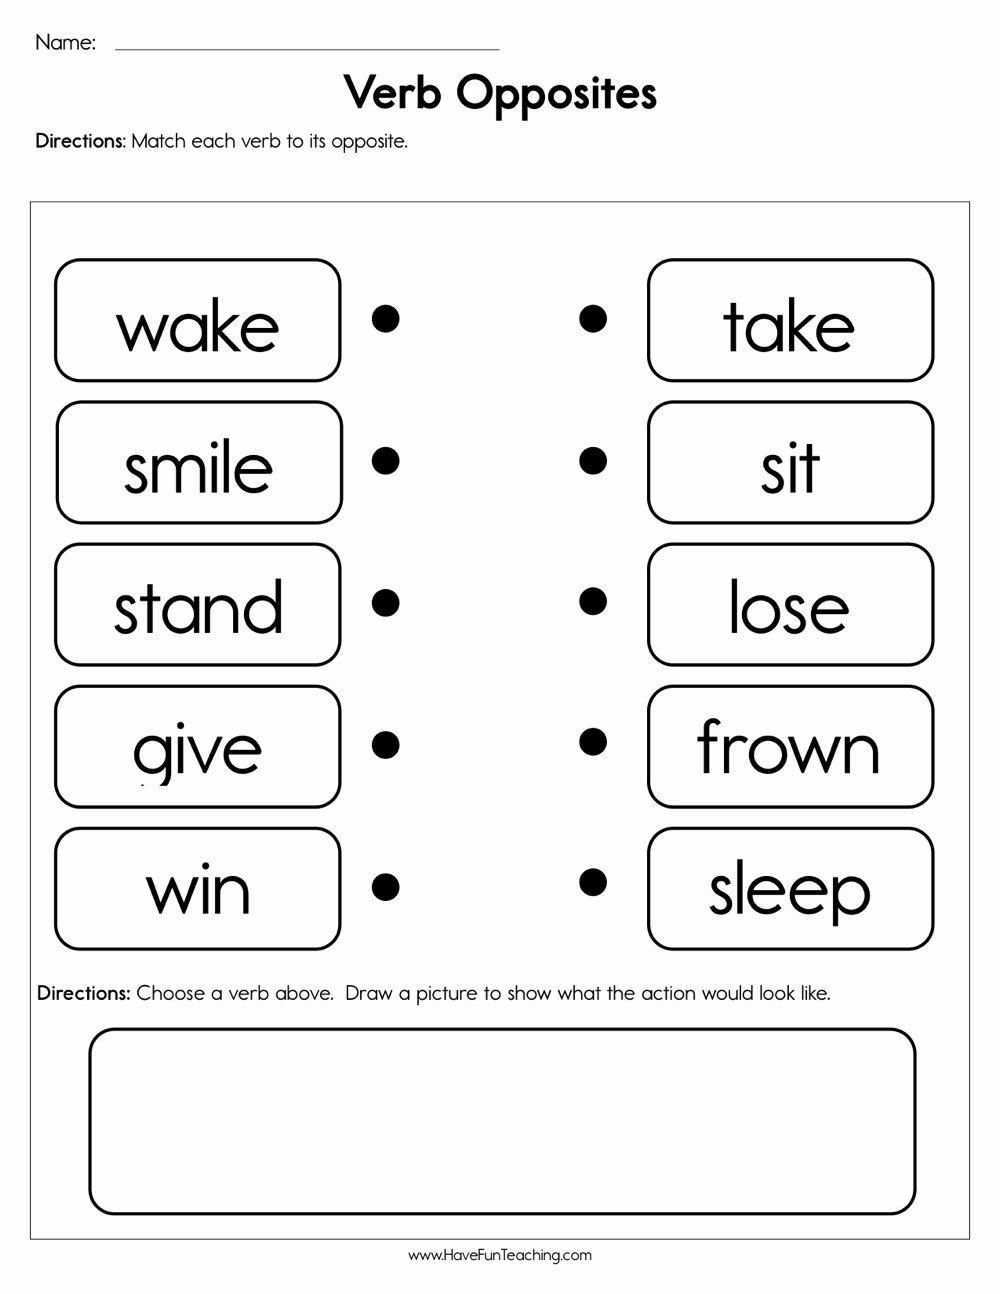 Opposite Worksheets for Preschoolers Inspirational Verb Opposites Worksheet